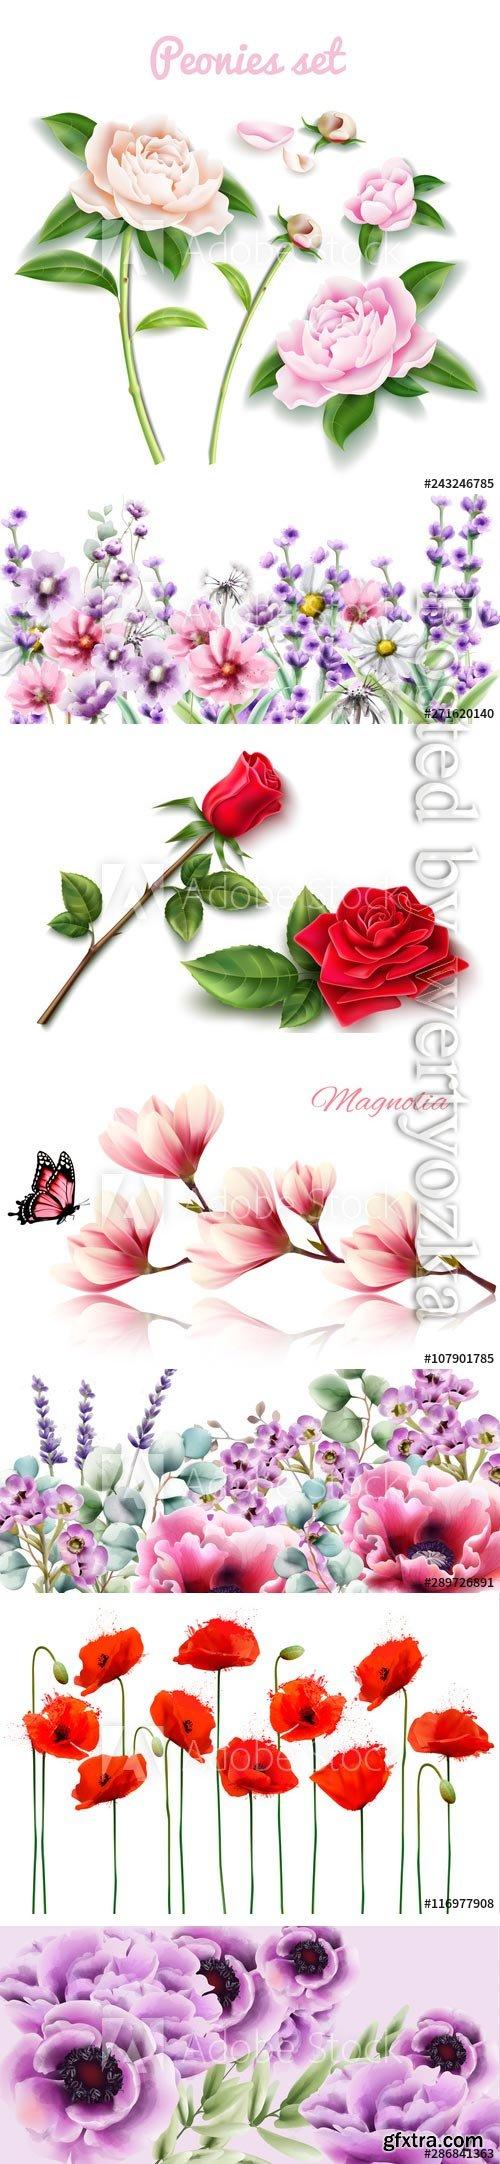 Beautiful flowers vector illustrations